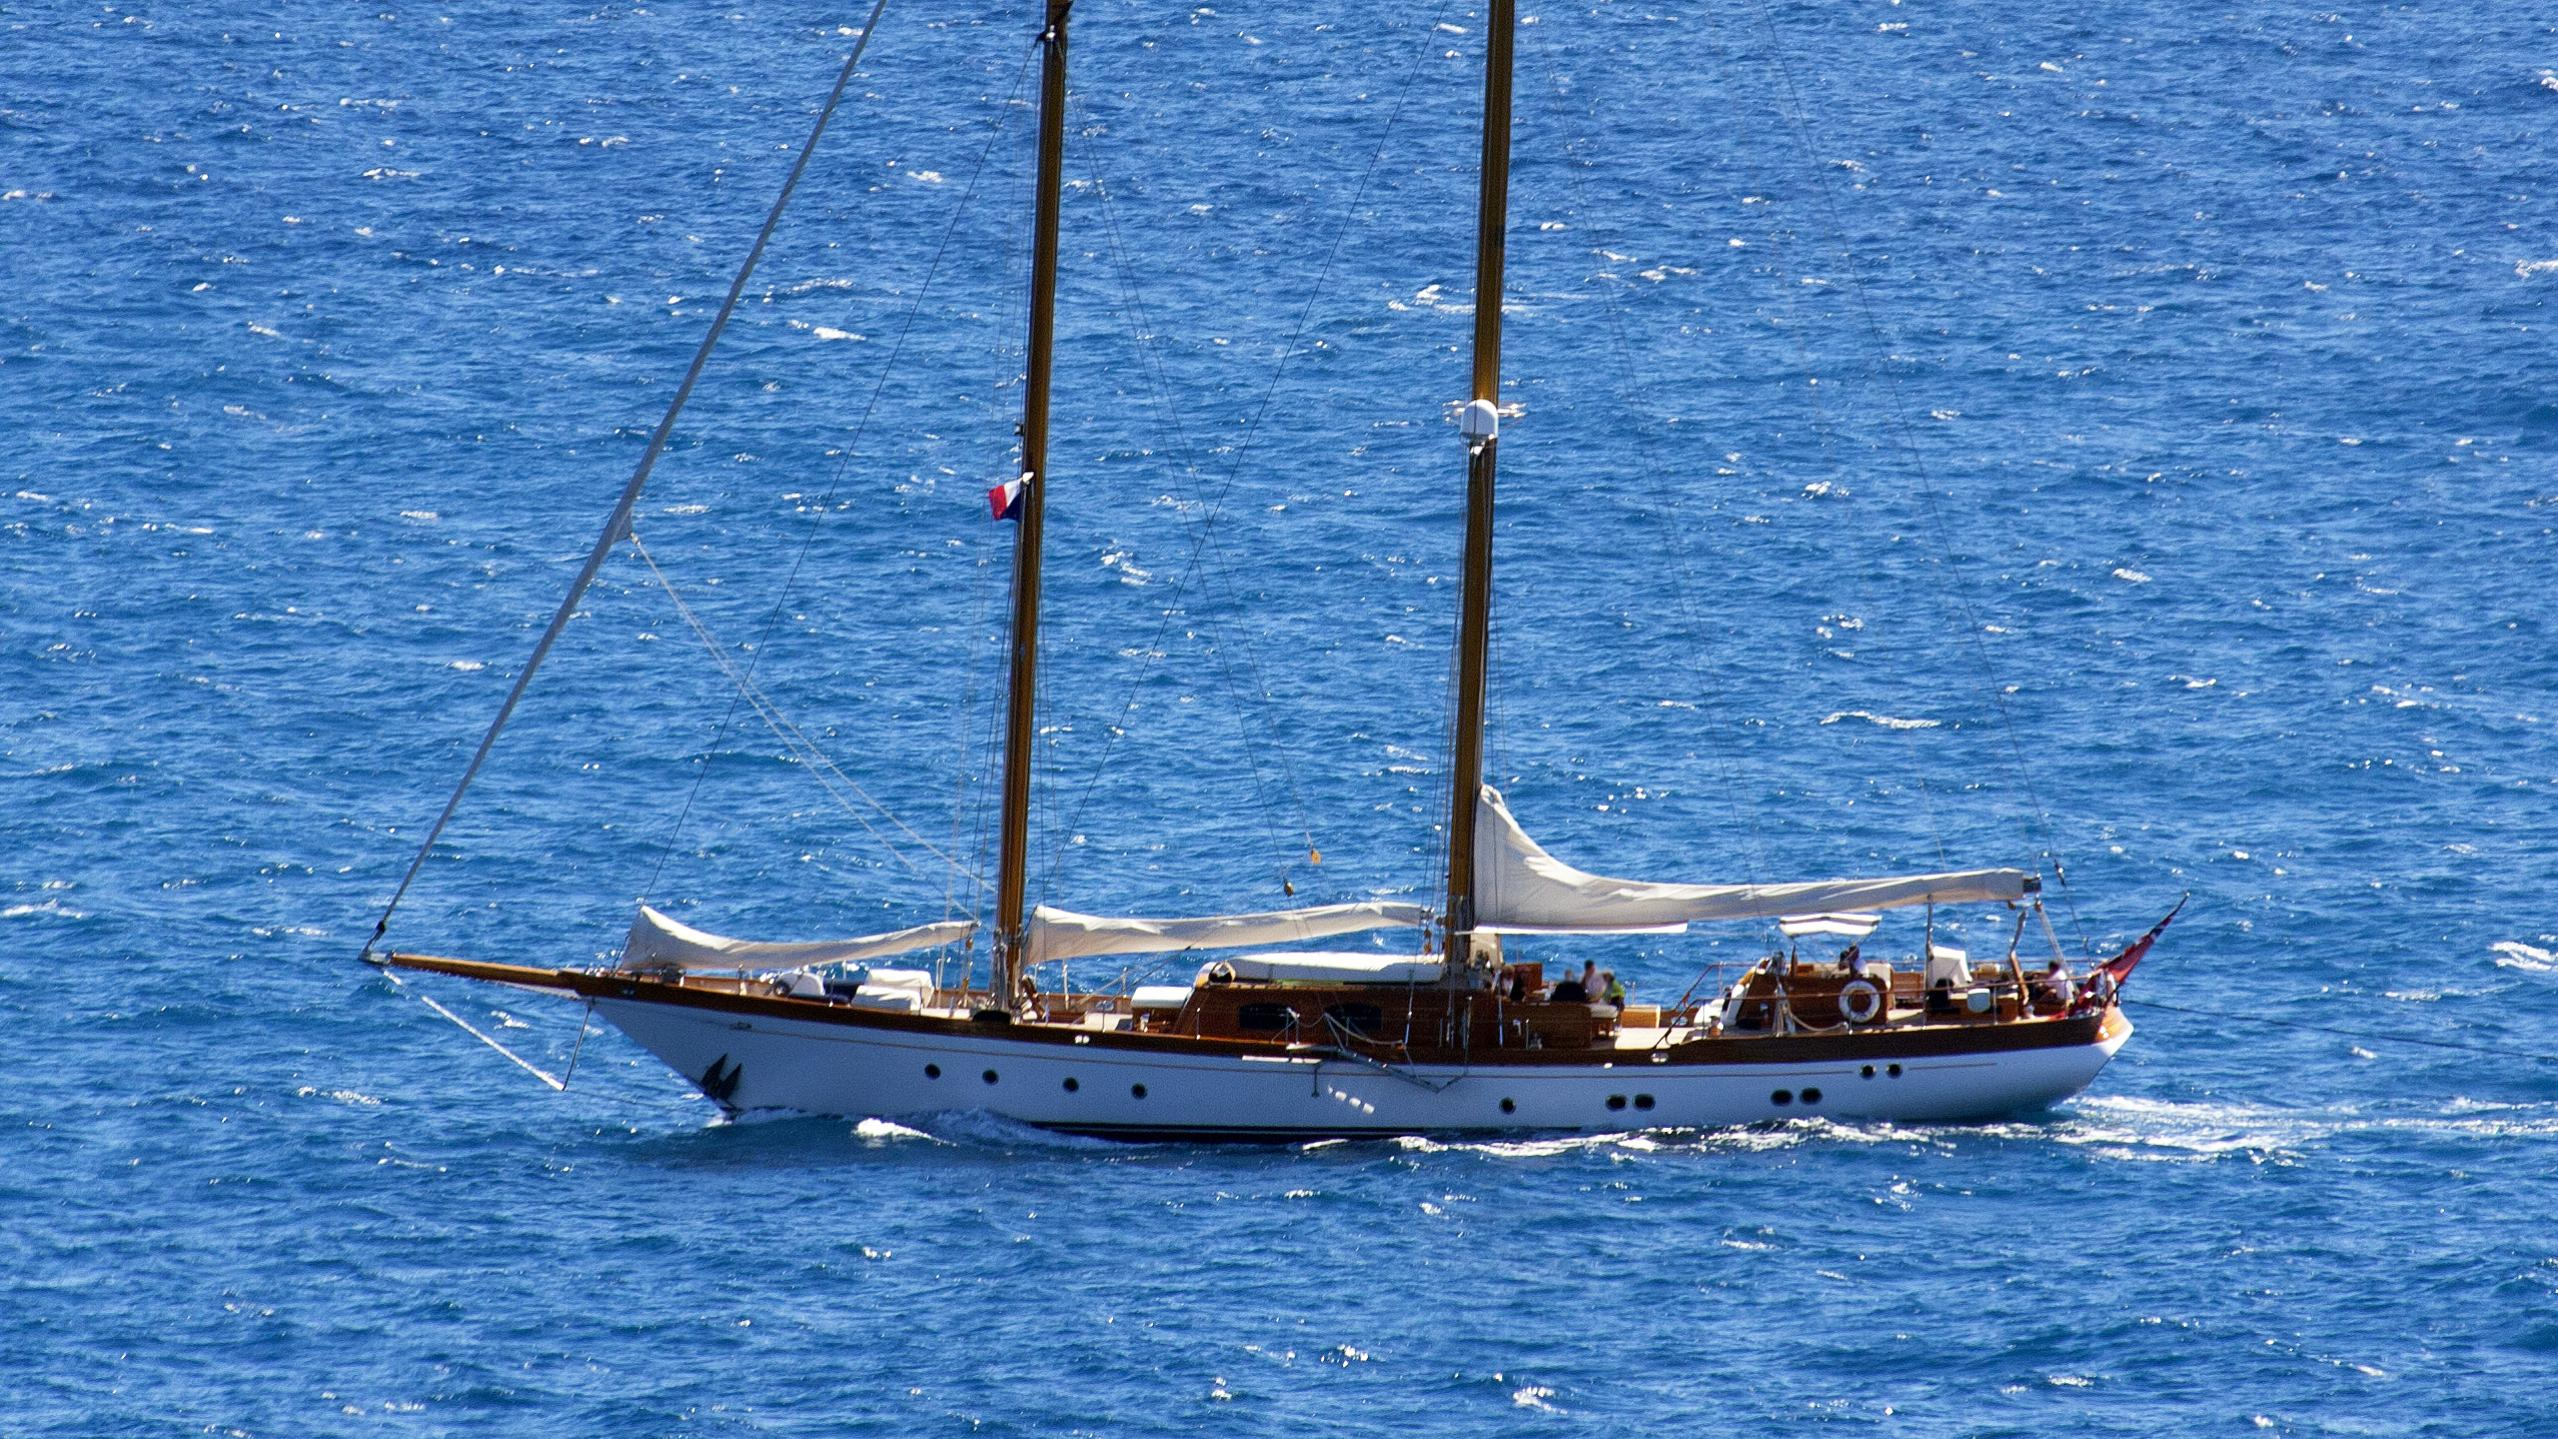 seljm-sailing-yacht-sangermani-1980-34m-aerial